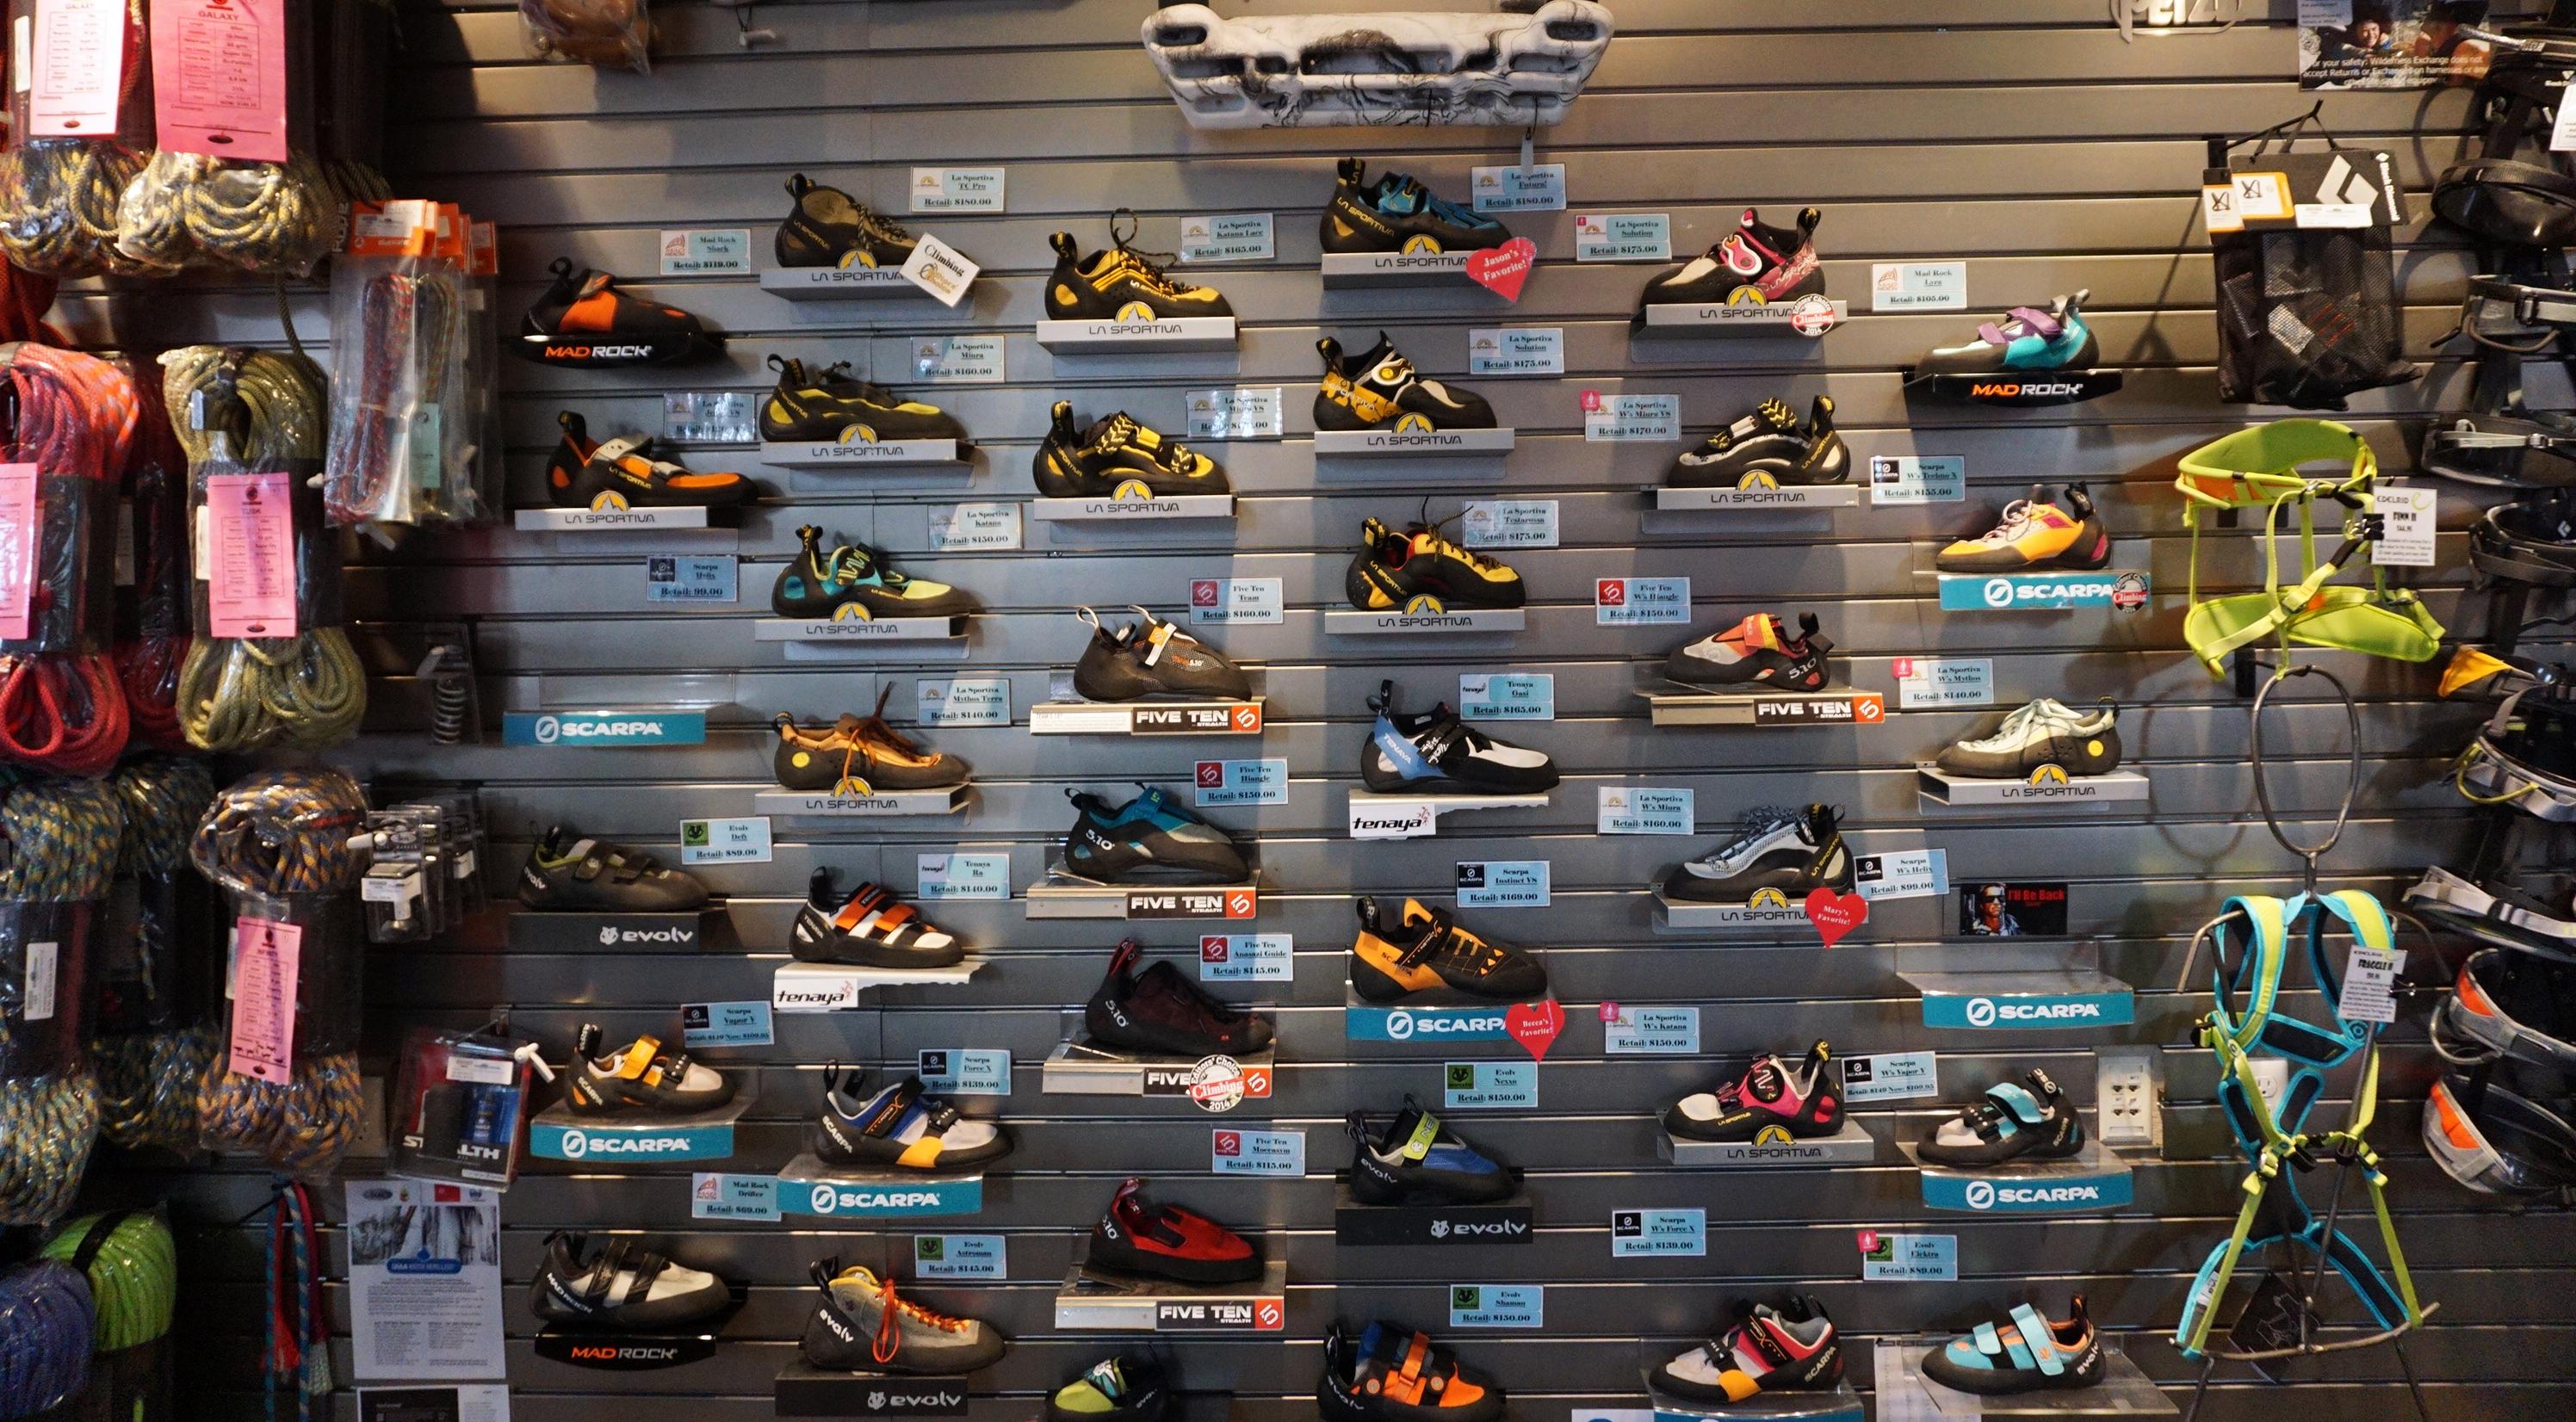 Gear store scales up online retail BusinessDen